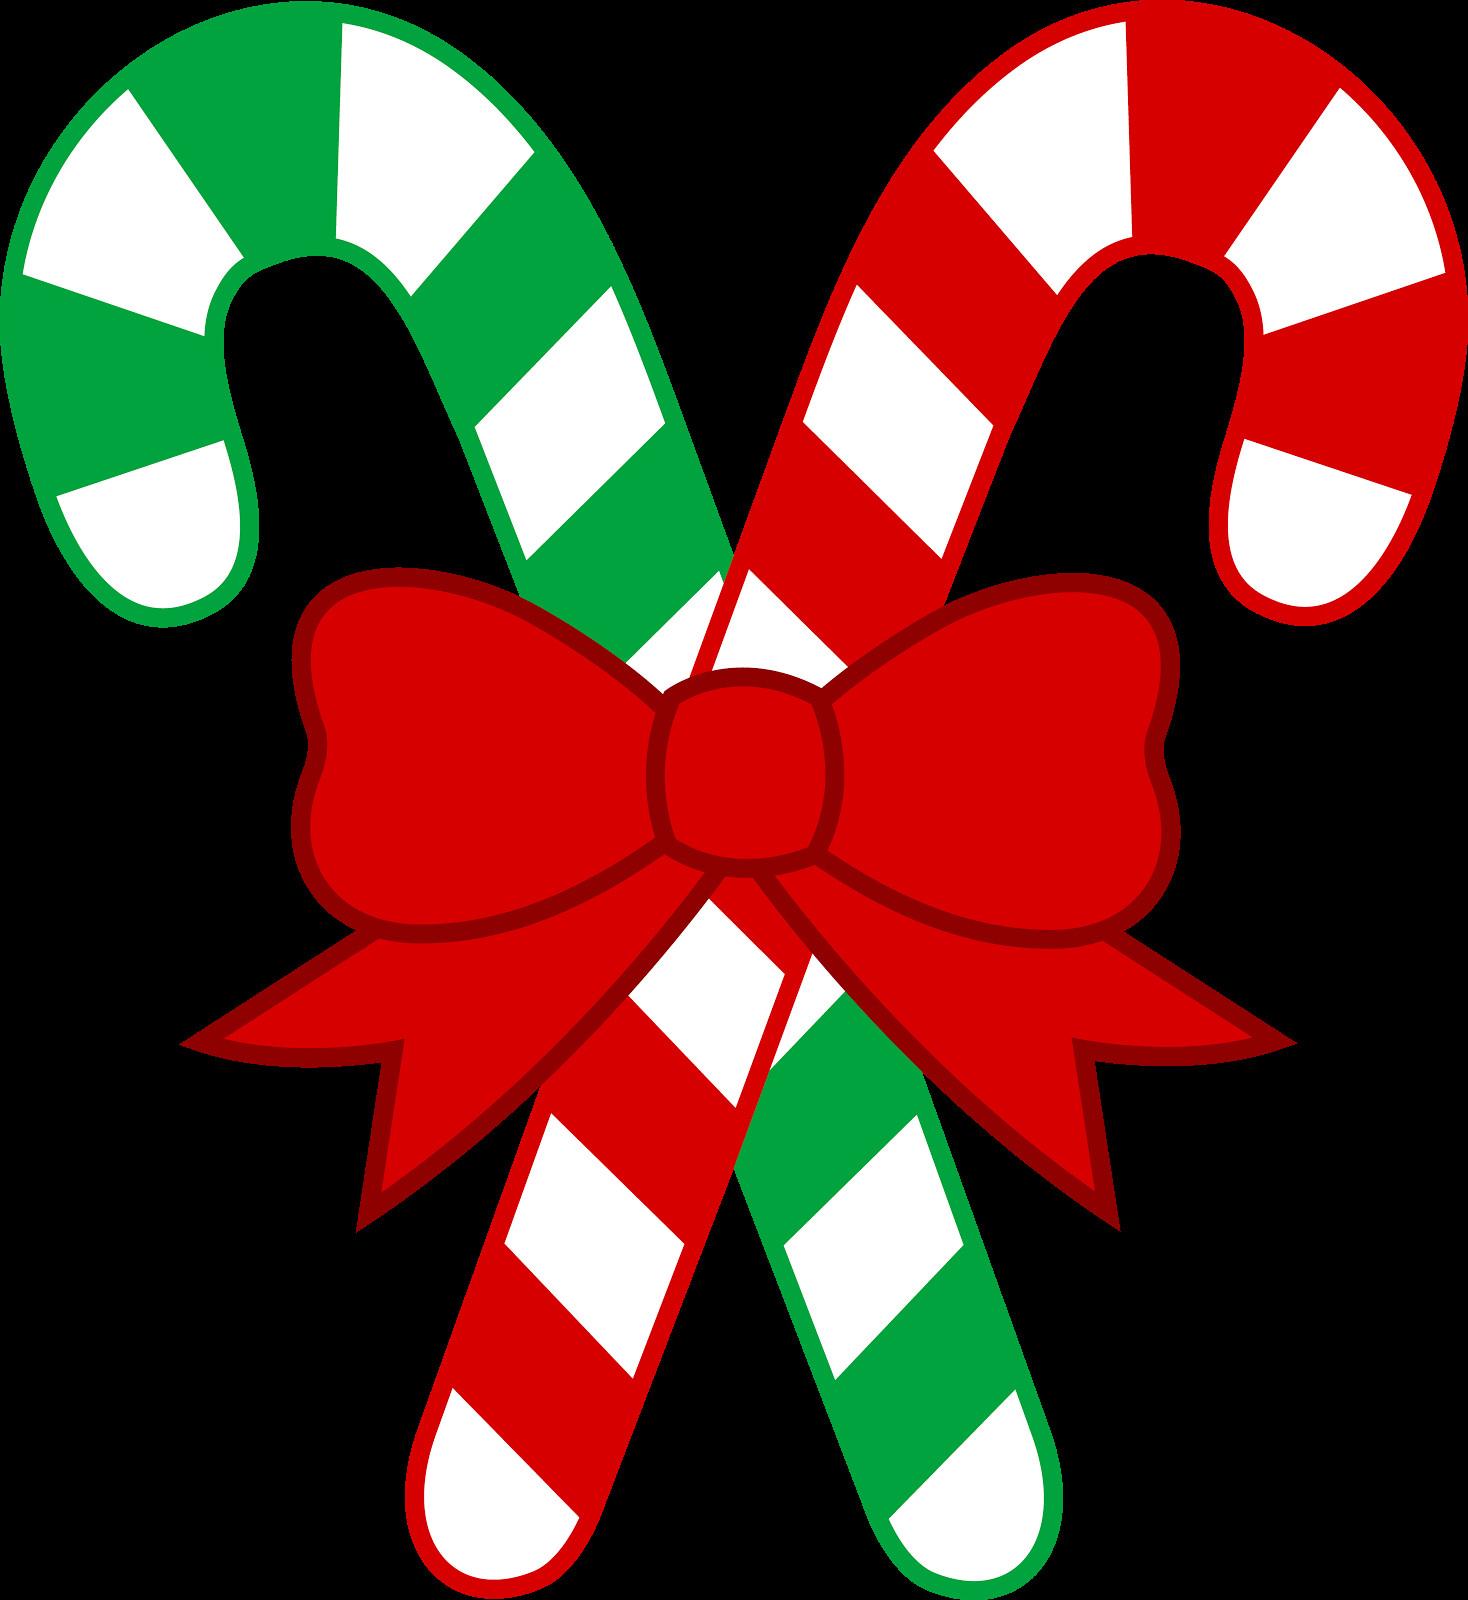 Candy Cane Christmas  Fantastic Dreams of Pamela K Kinney December 2012